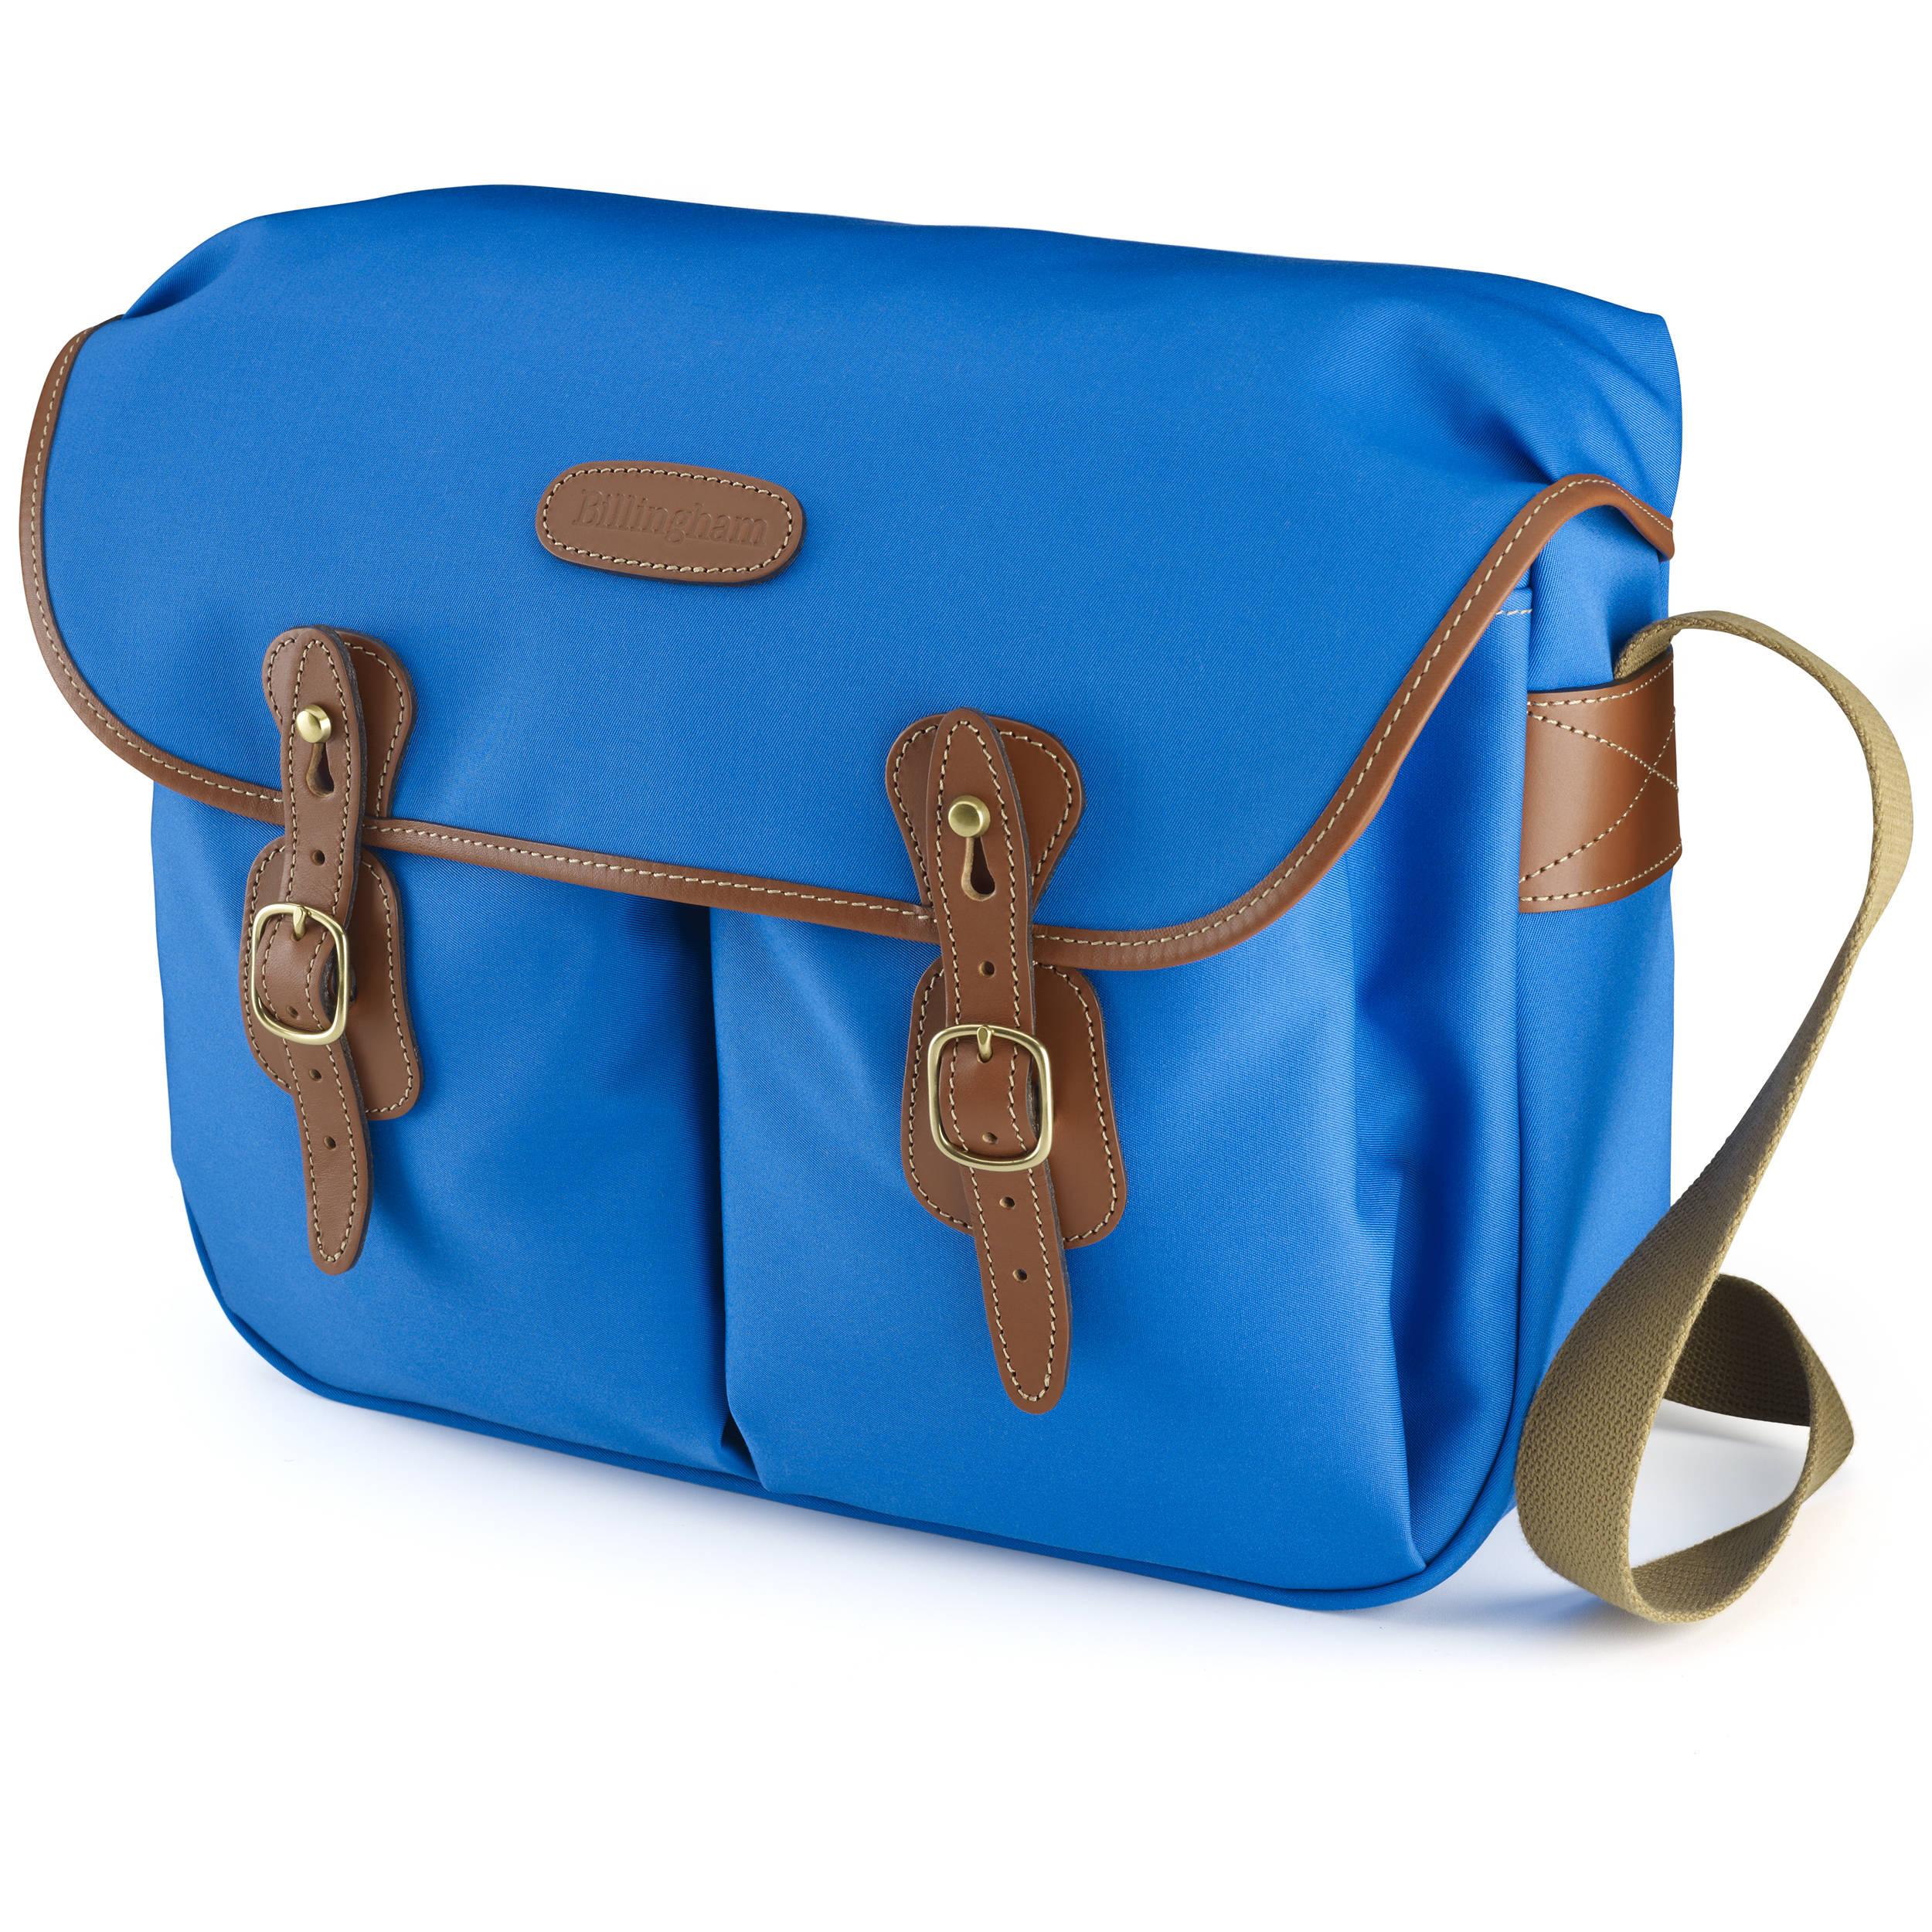 365fa8ffc Billingham Hadley Large Canvas Shoulder Bag (Imperial Blue with Tan Leather  Trim)